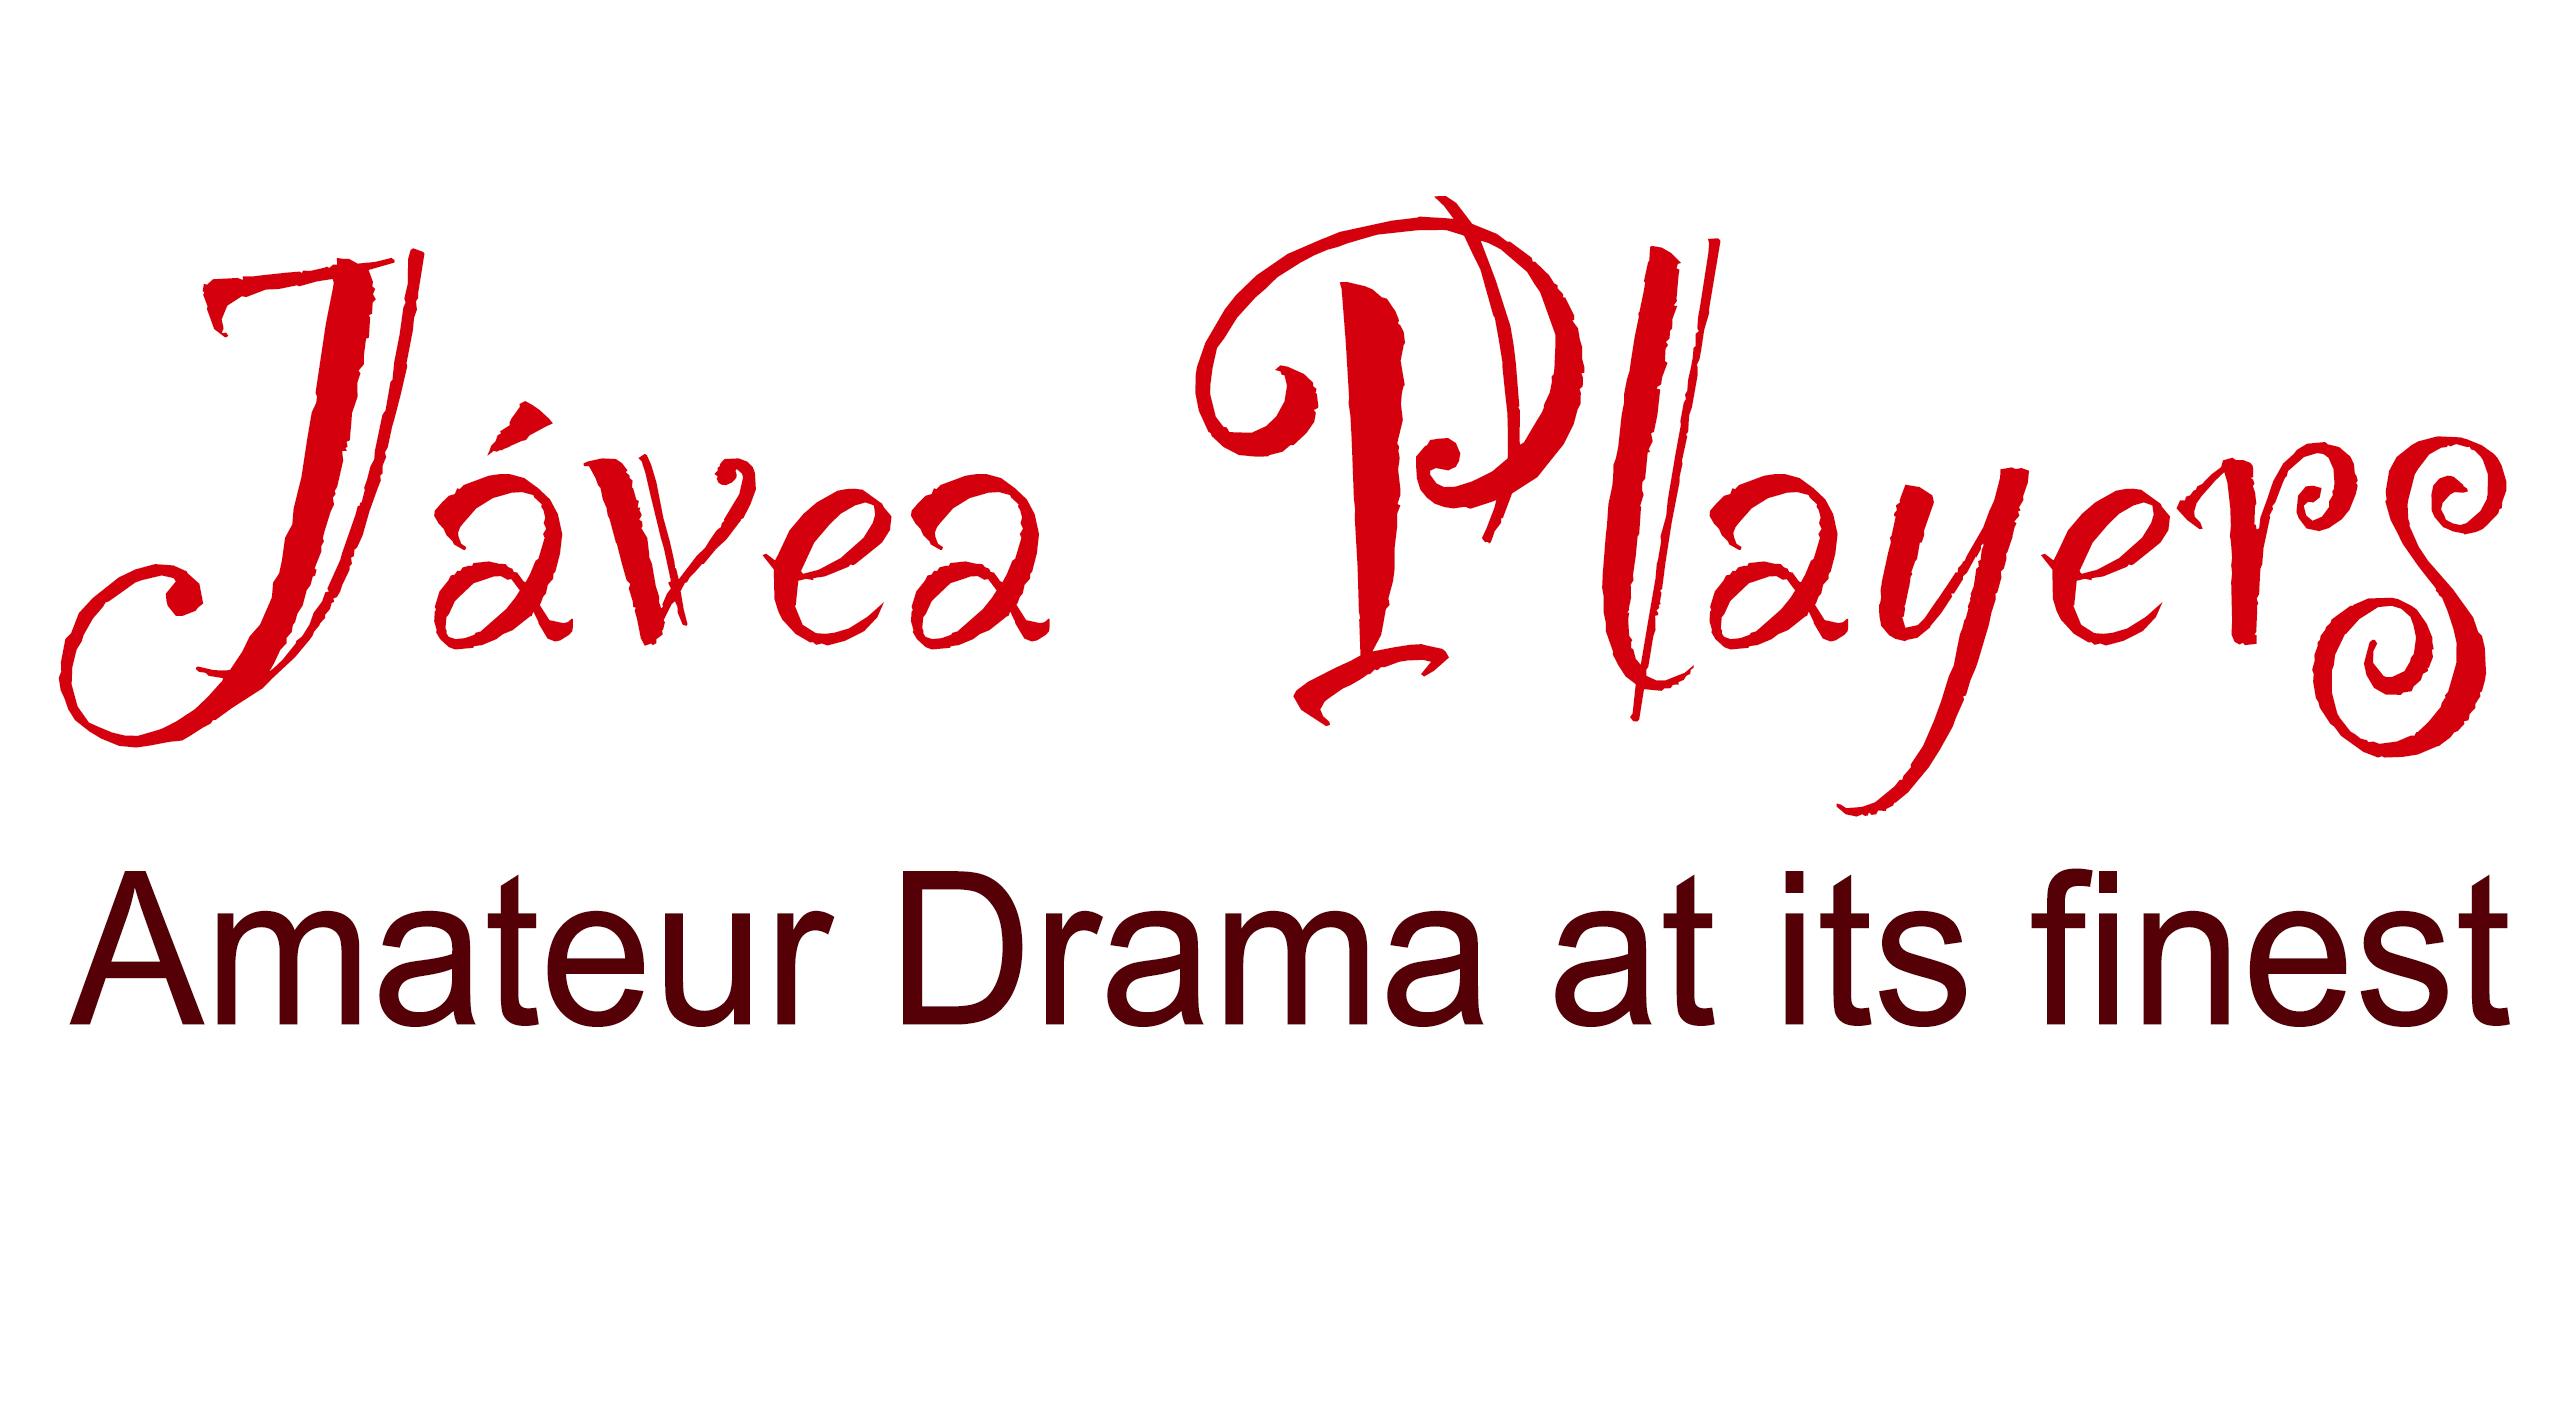 Javea Players Logo